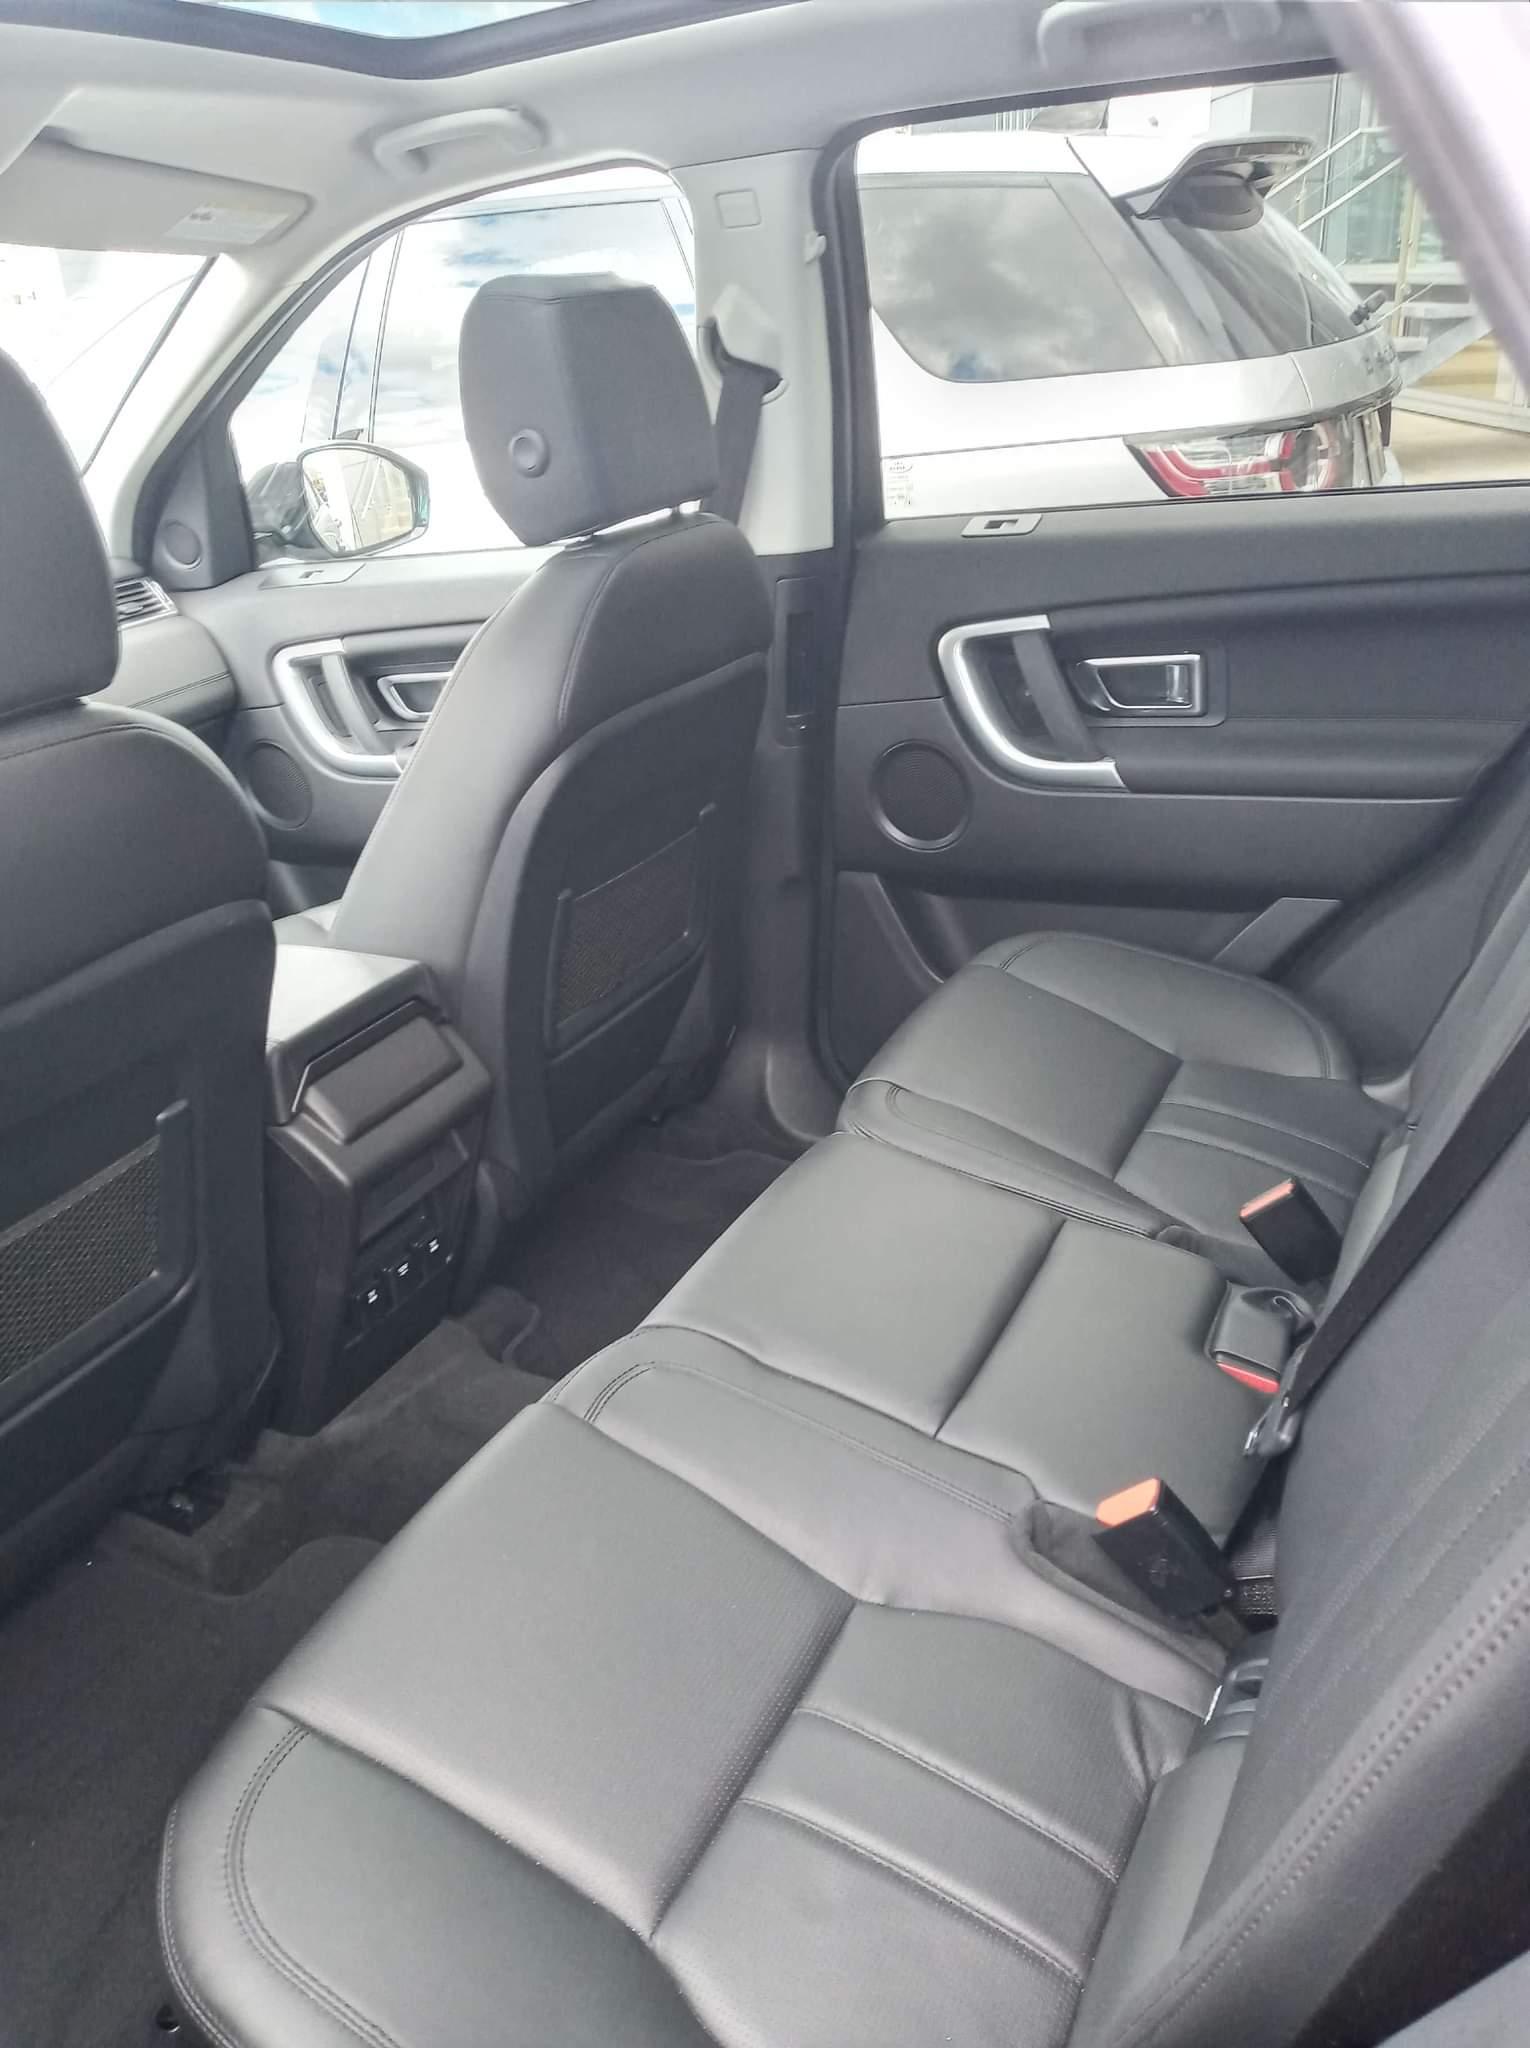 vente voiture occasion boite automatique tunisie land rover discovery sport